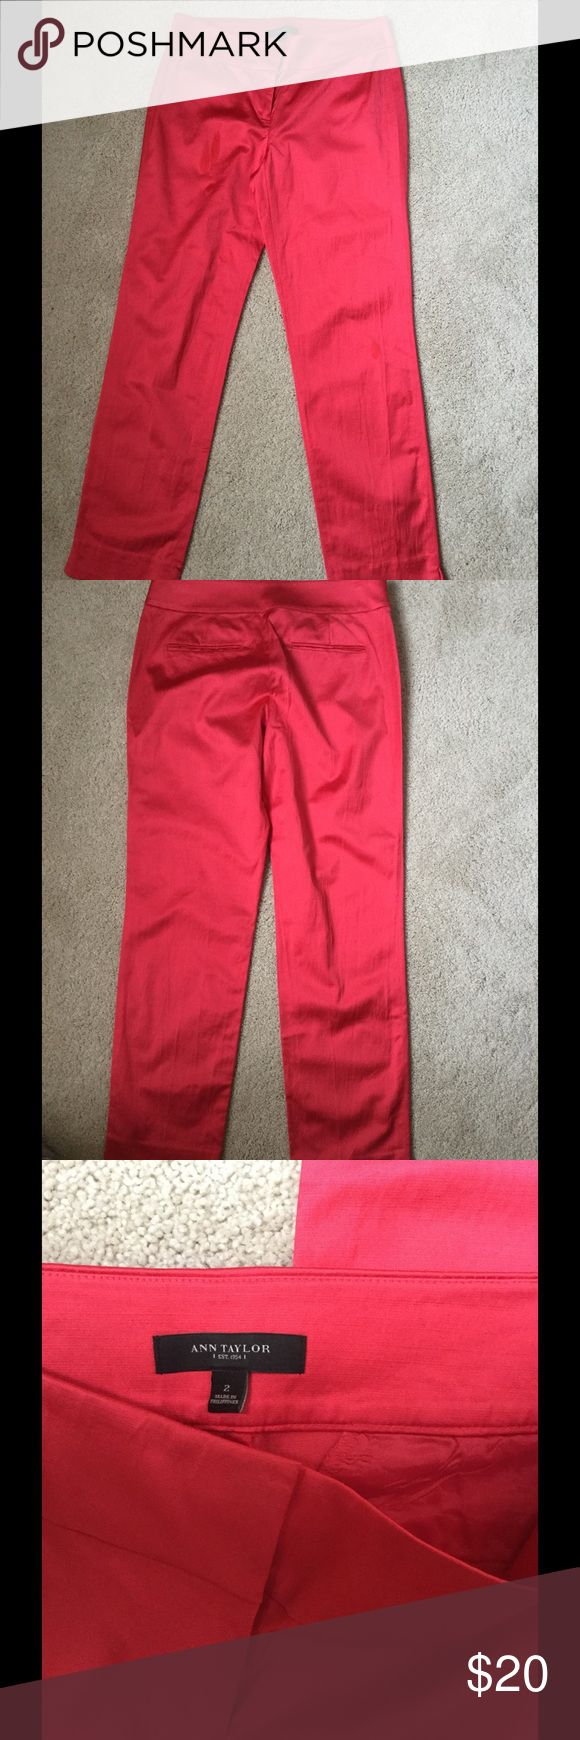 "Like new Ann Taylor pants ,like silk material . Worn one time Ann Taylor pants . 27"" inseam 15,5"" waist ❌Price firm . Ann Taylor Pants Straight Leg"